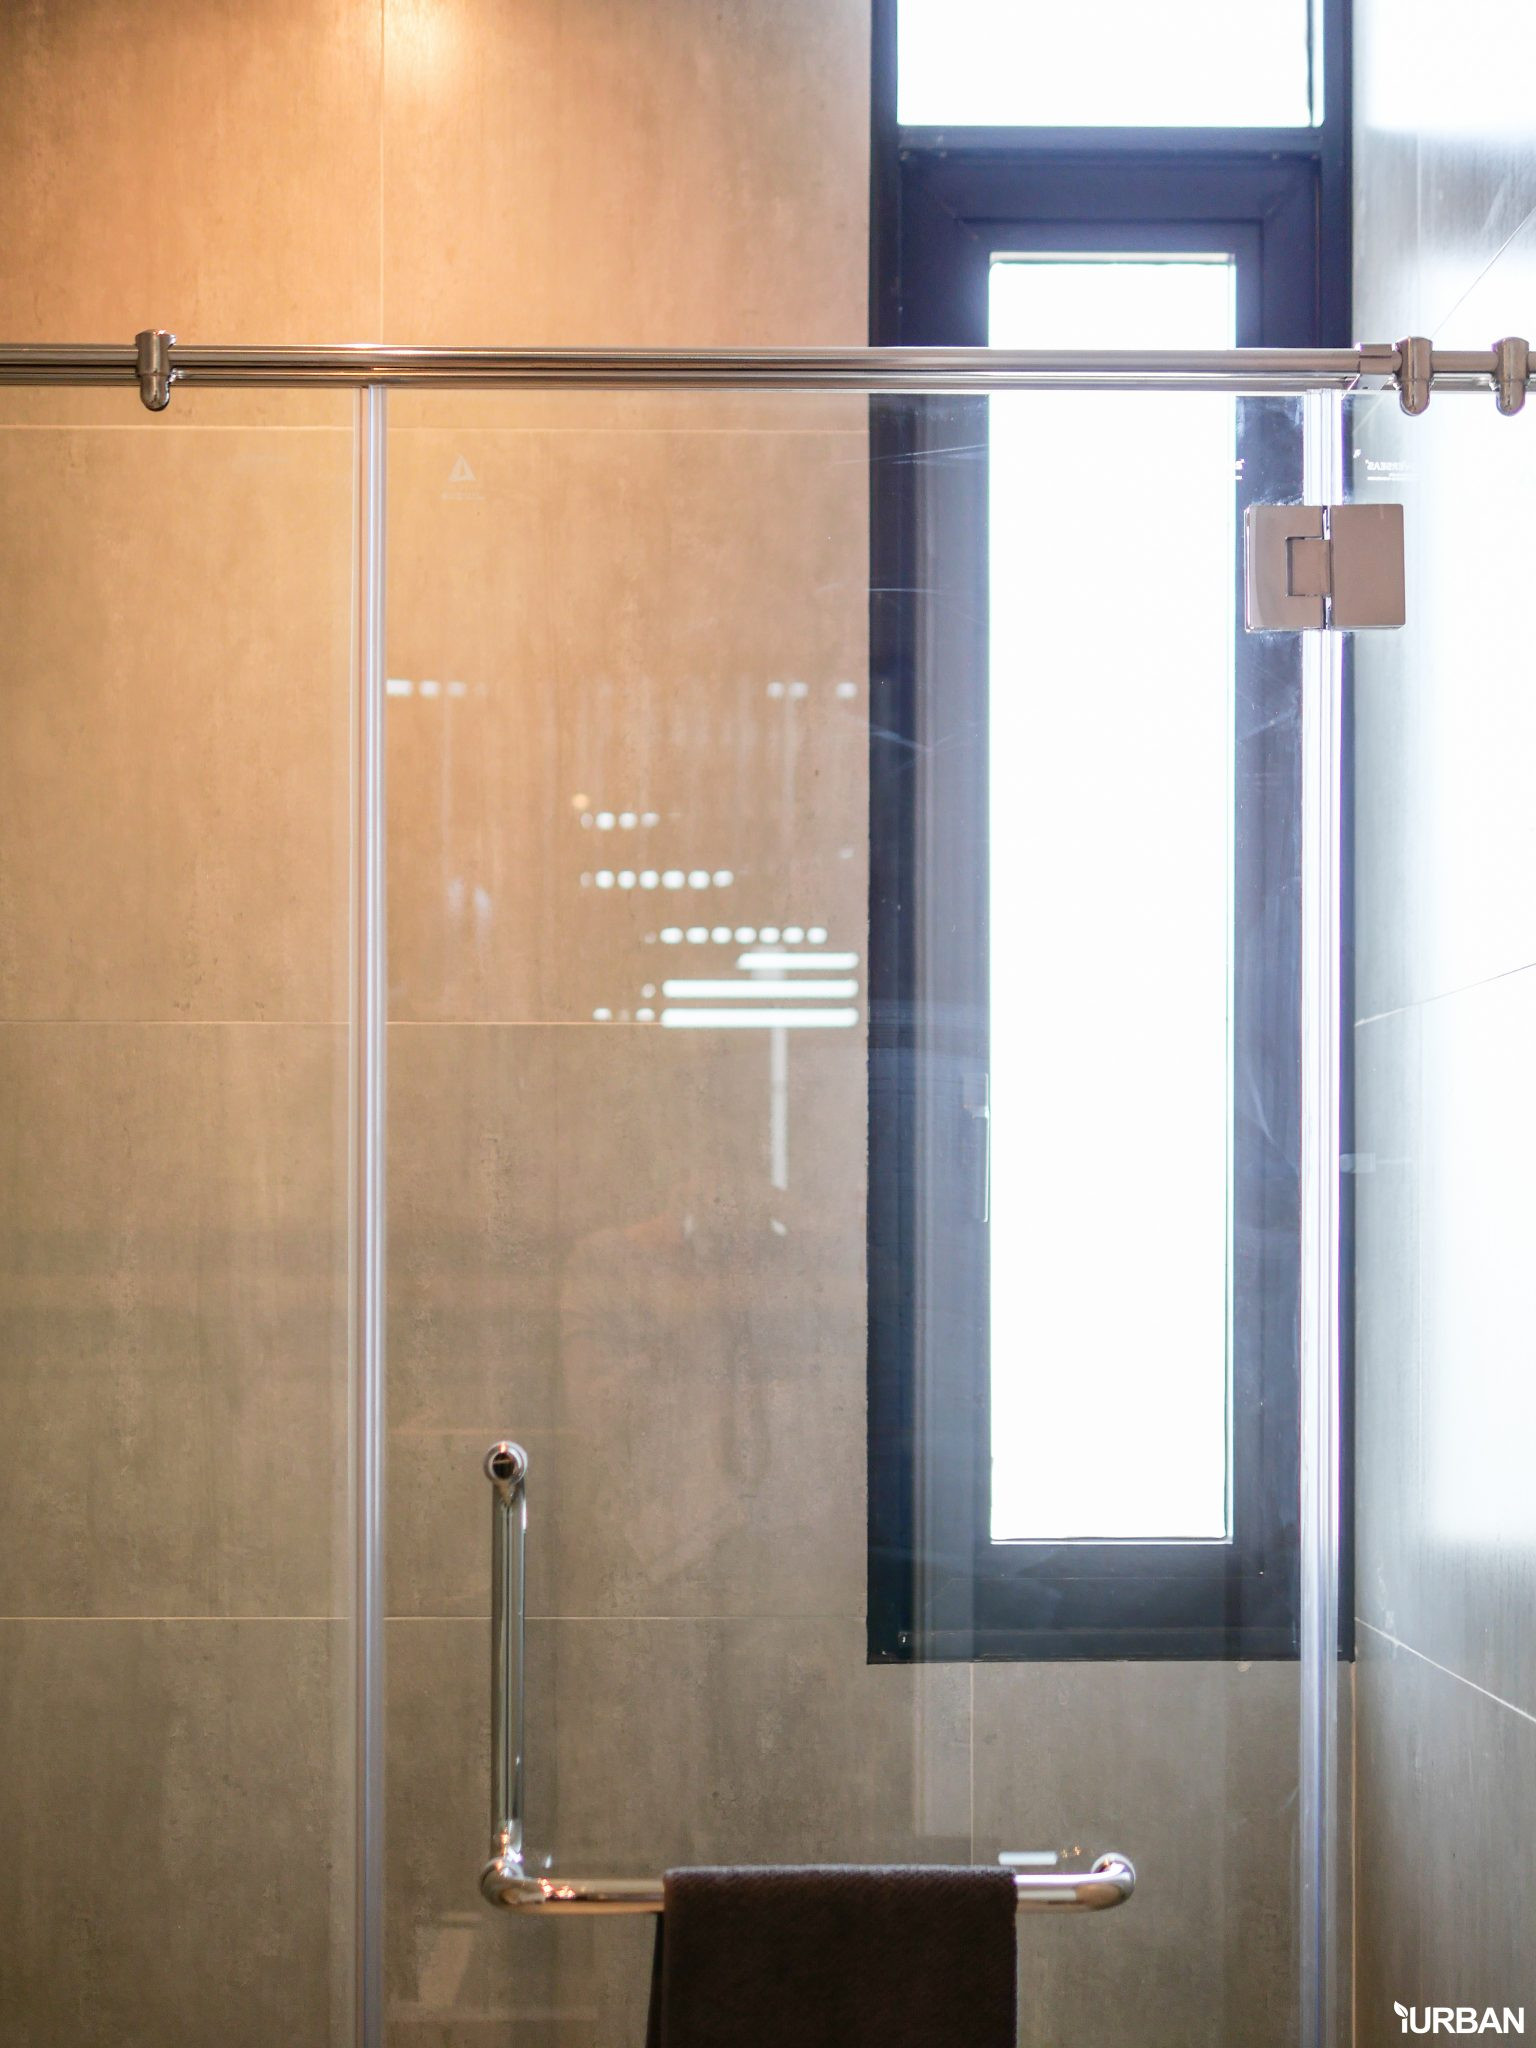 AIRES RAMA9 รีวิว Luxury Townhome 3.5 ชั้น + Rooftop ออกแบบสวย ย่านพระราม9 (ใกล้ รพ.สมิติเวช) 77 - AIRES